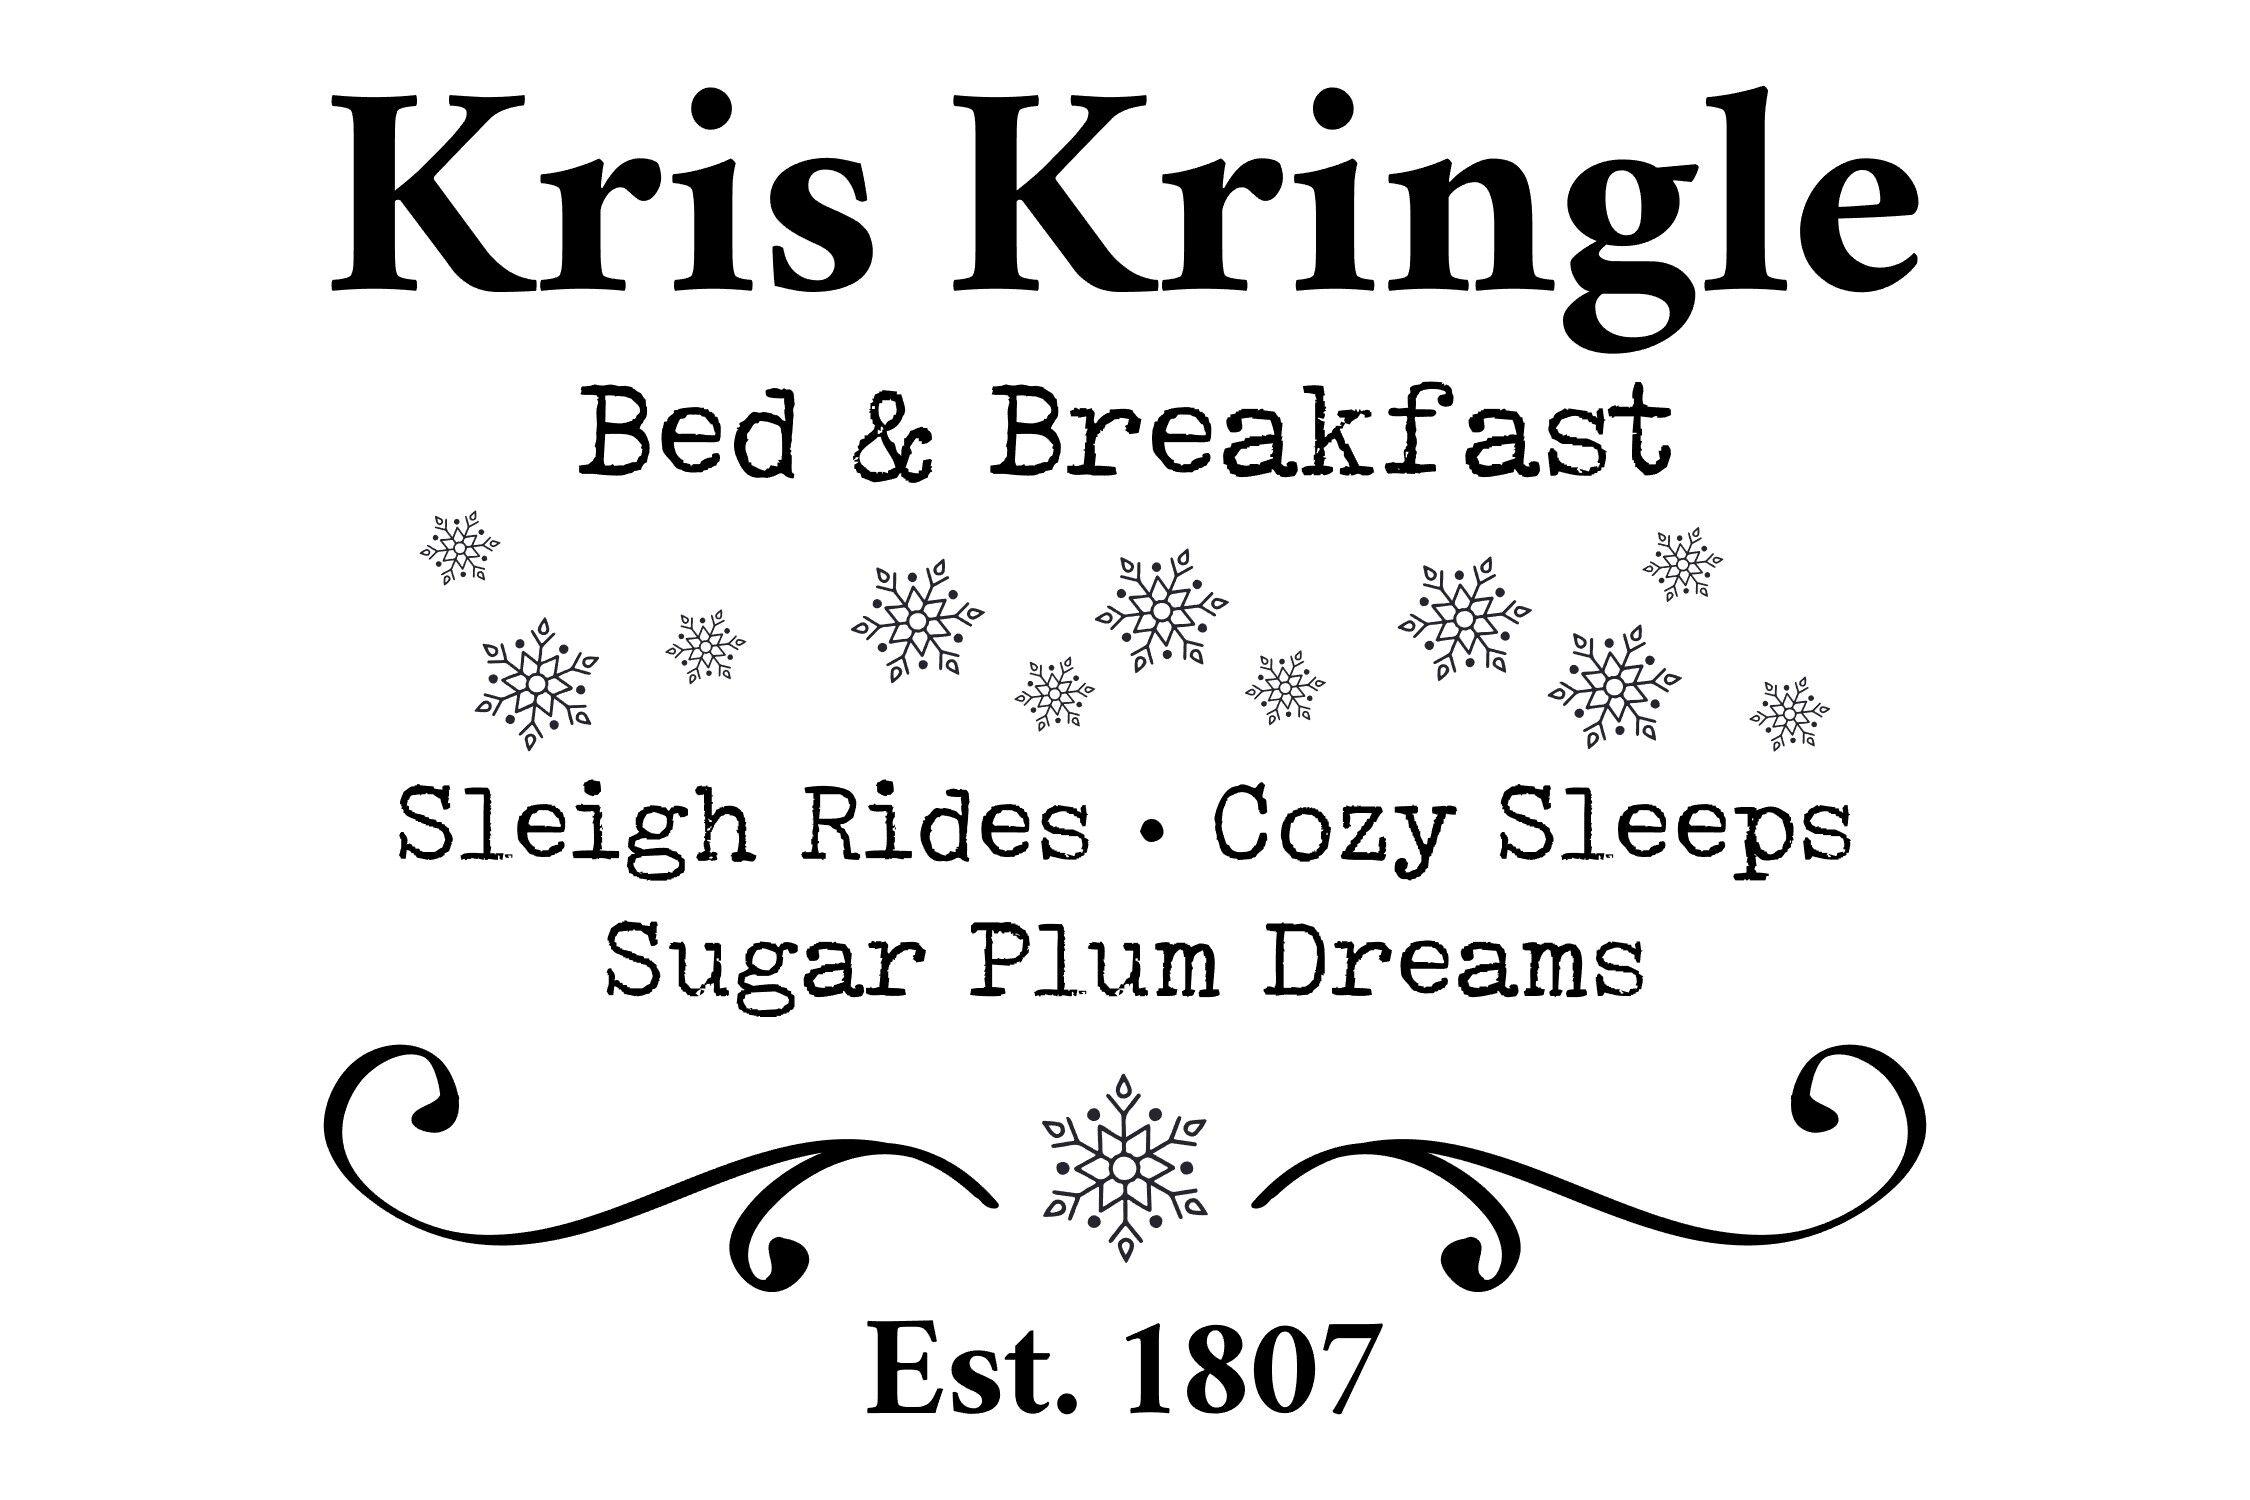 Kris Kringle Bed Breakfast Christmas Svg Png Eps By Studio